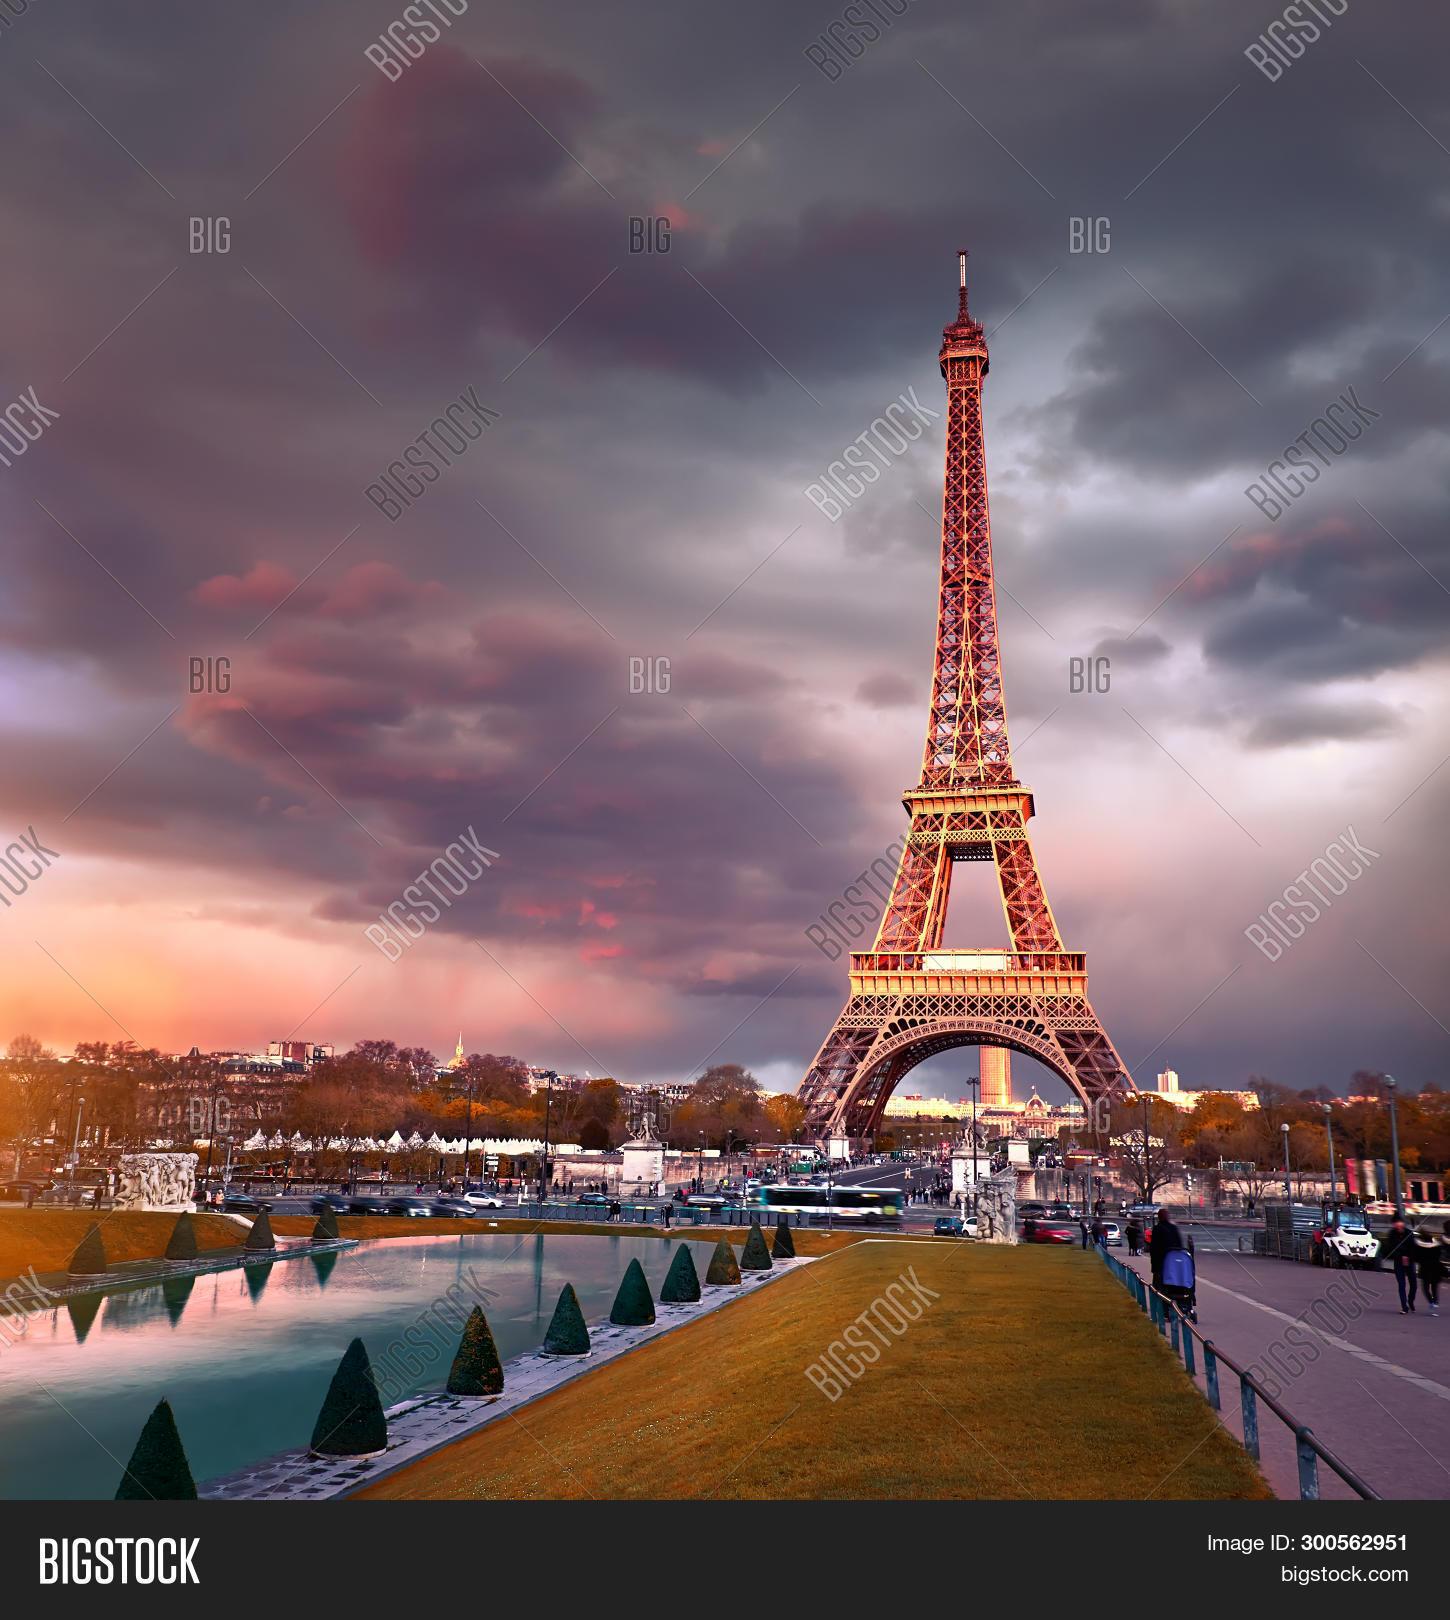 Eiffel Tower On Sunset Image Photo Free Trial Bigstock